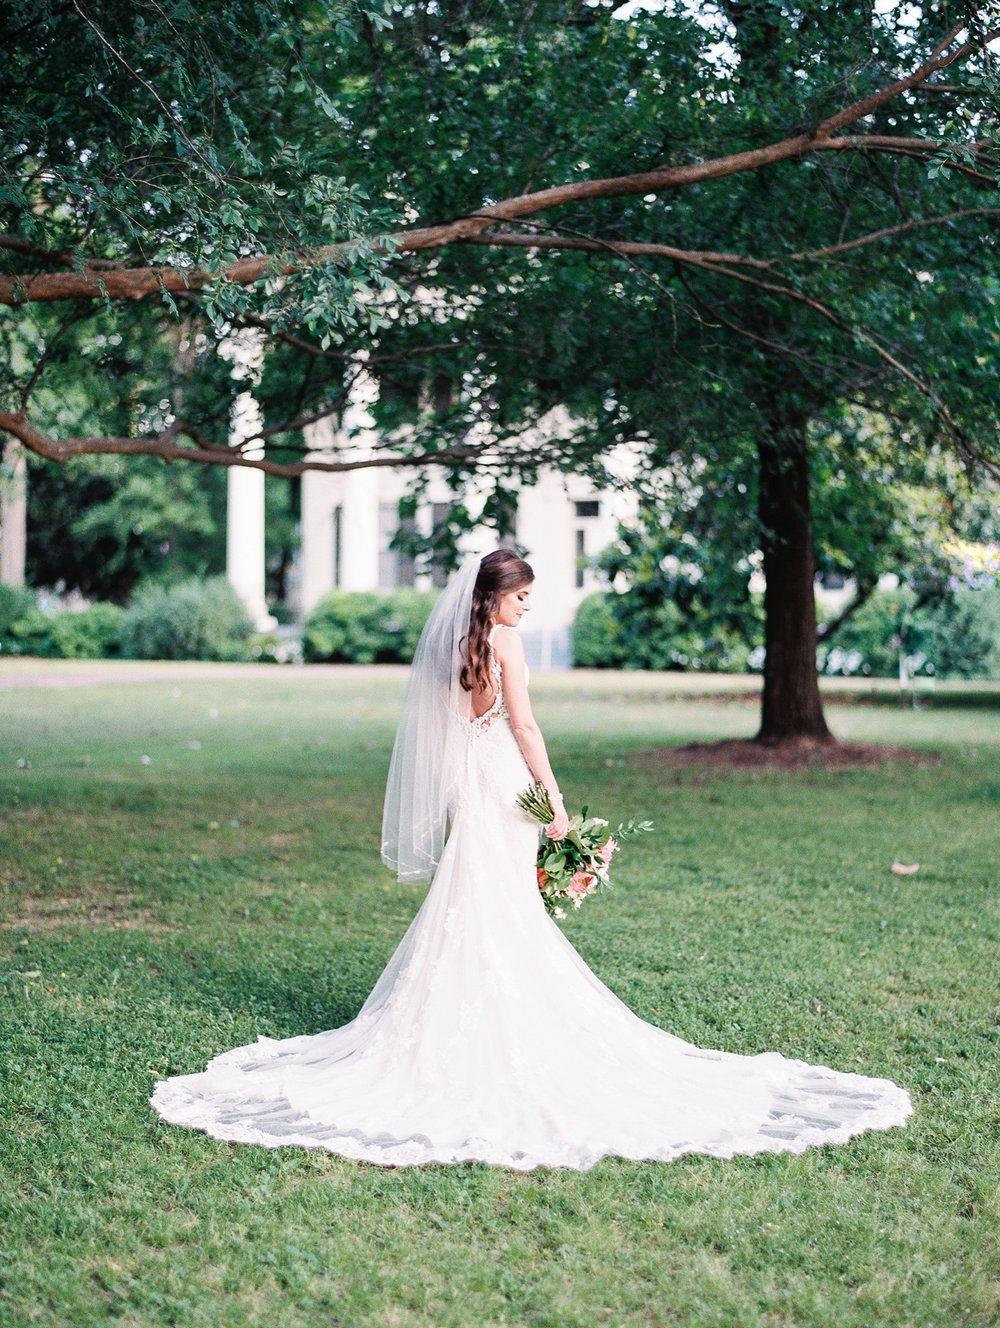 The-Terry-House-Wedding-Little-Rock-Arkansas_0086.jpg